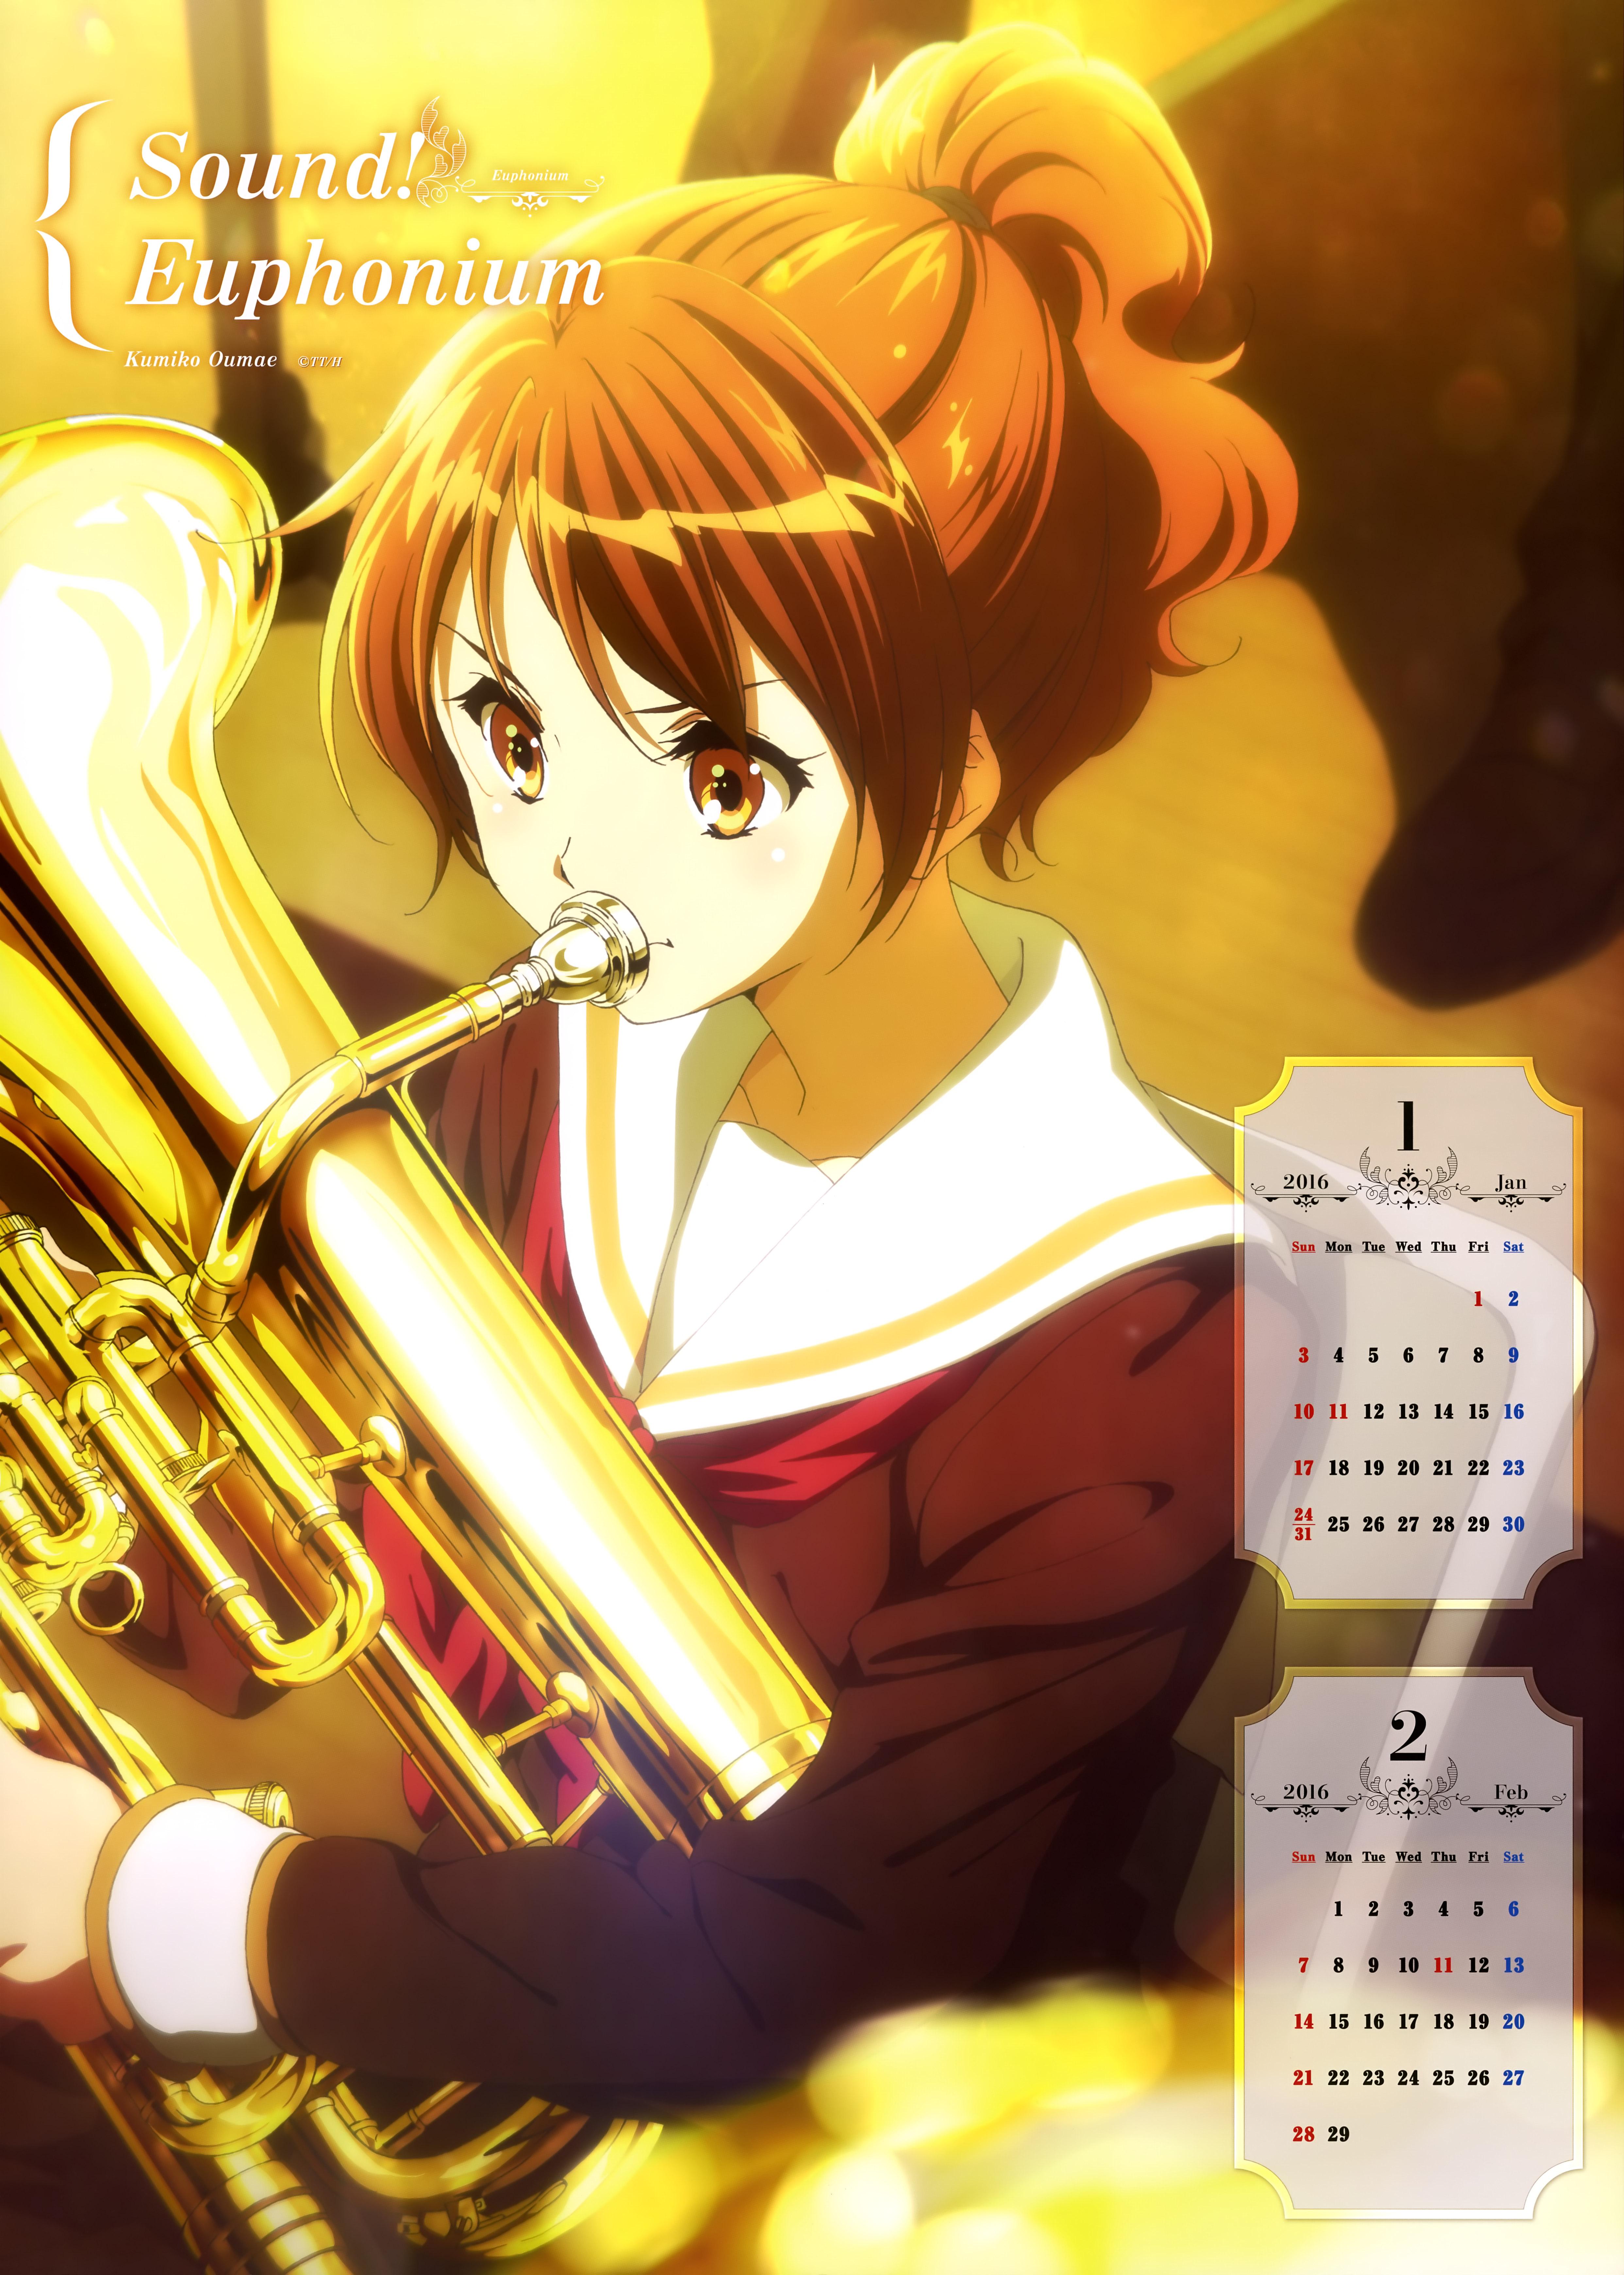 Hibike! Euphonium Anime calendar 2016 0001